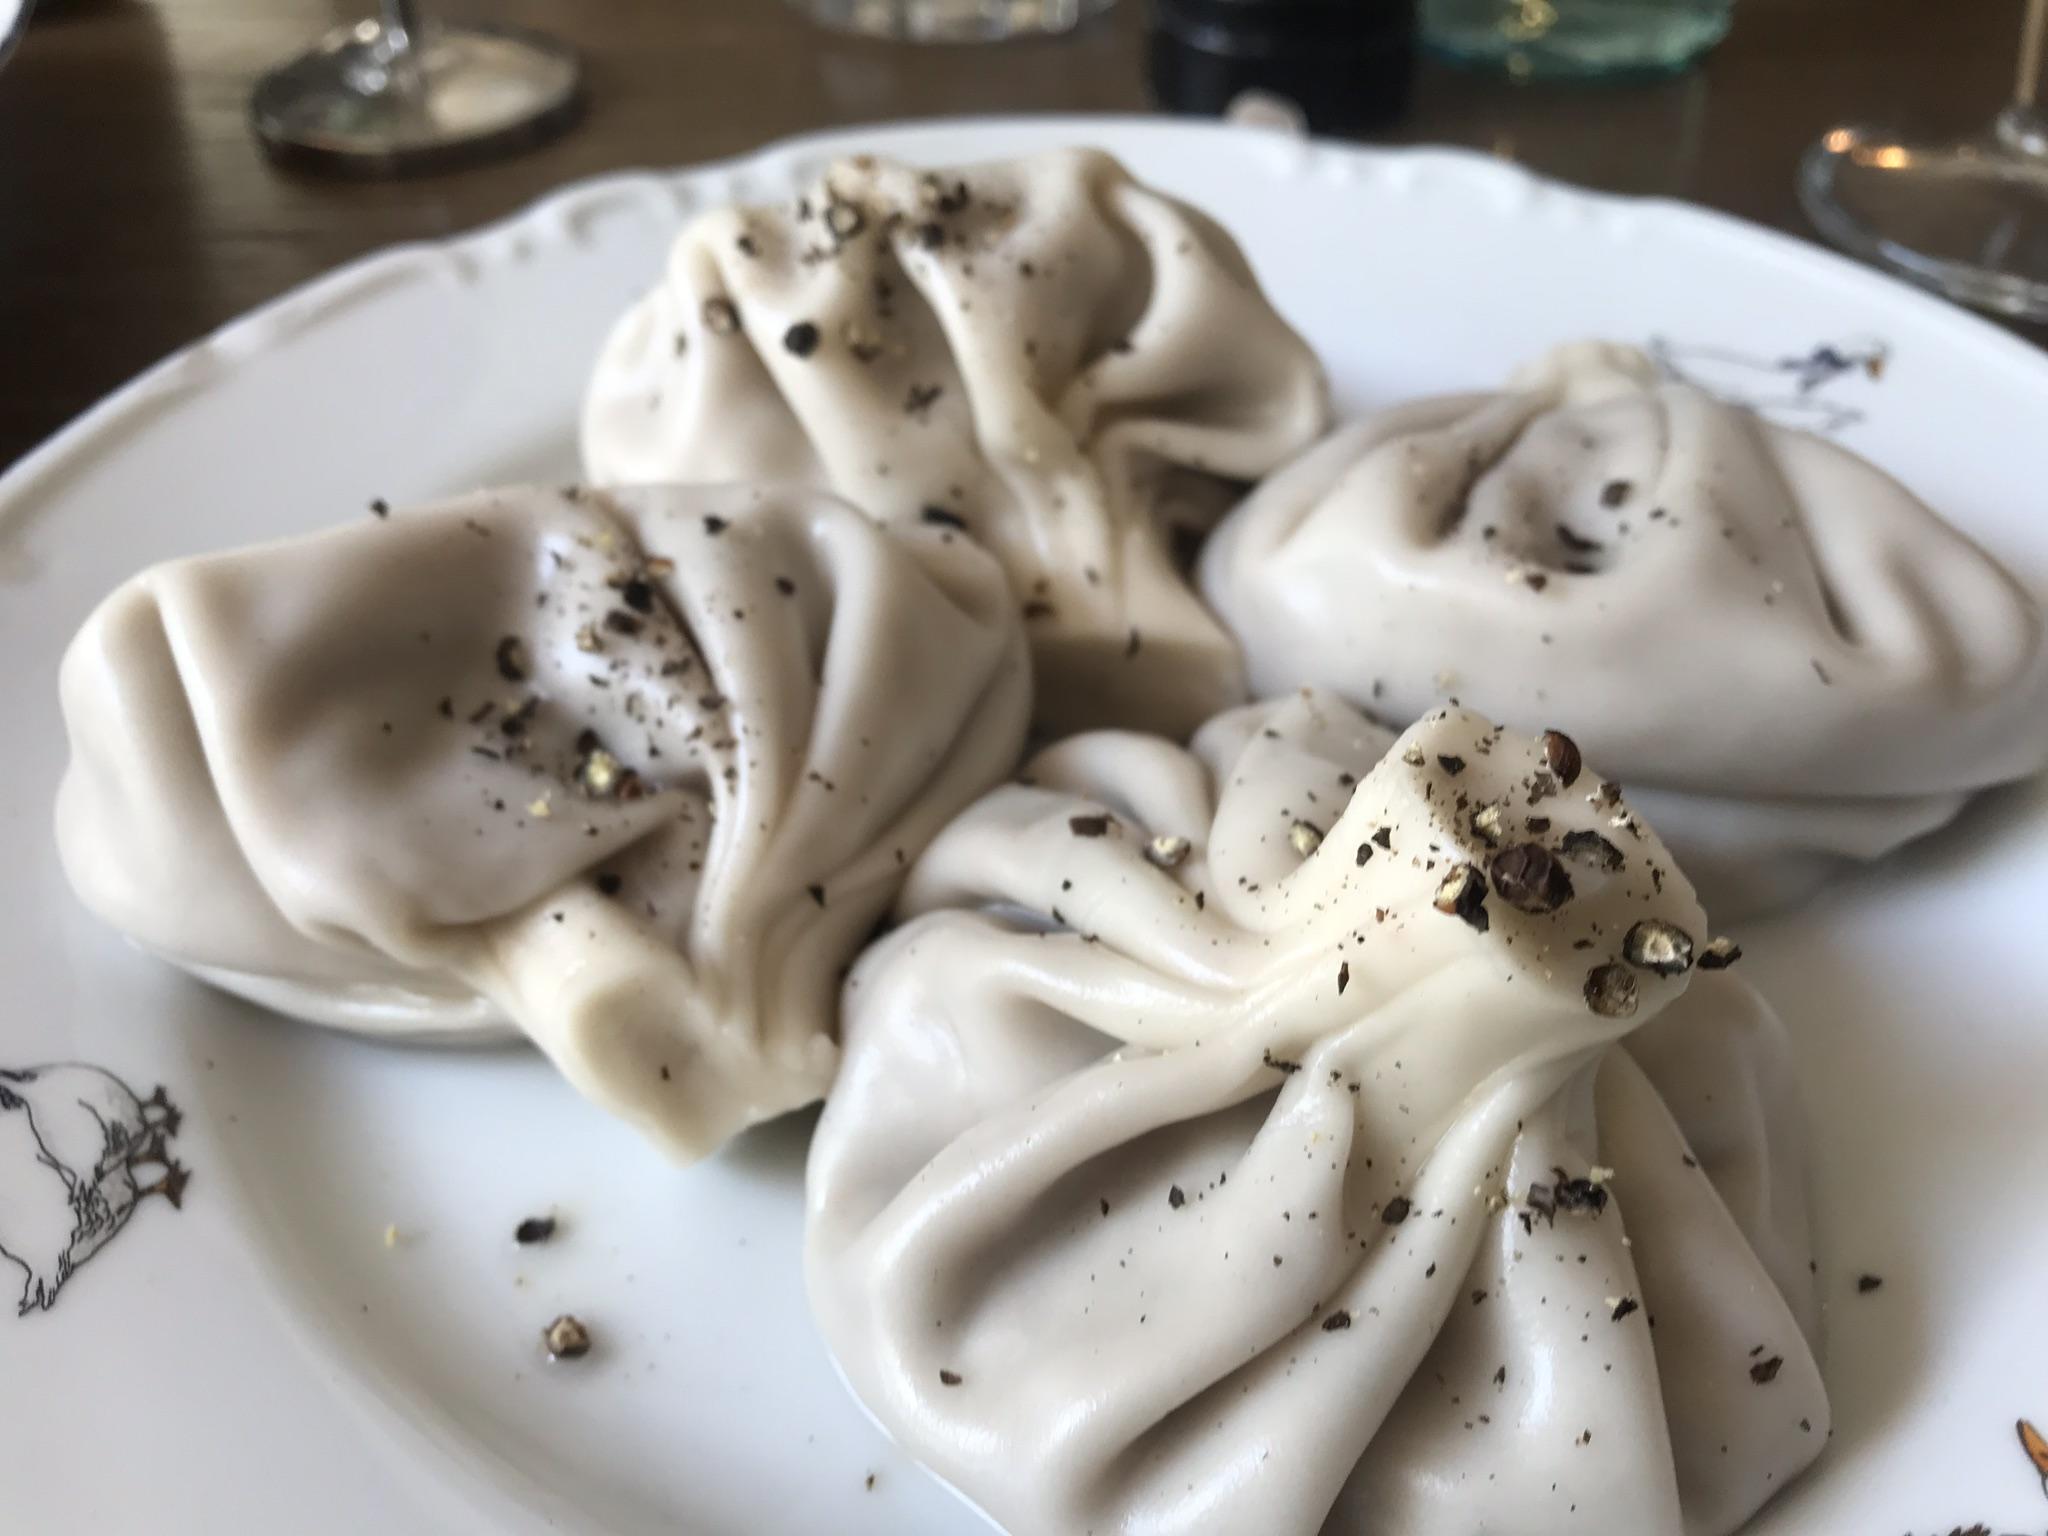 Khinkali (soup dumplings). Photo by Alexa van Sickle.